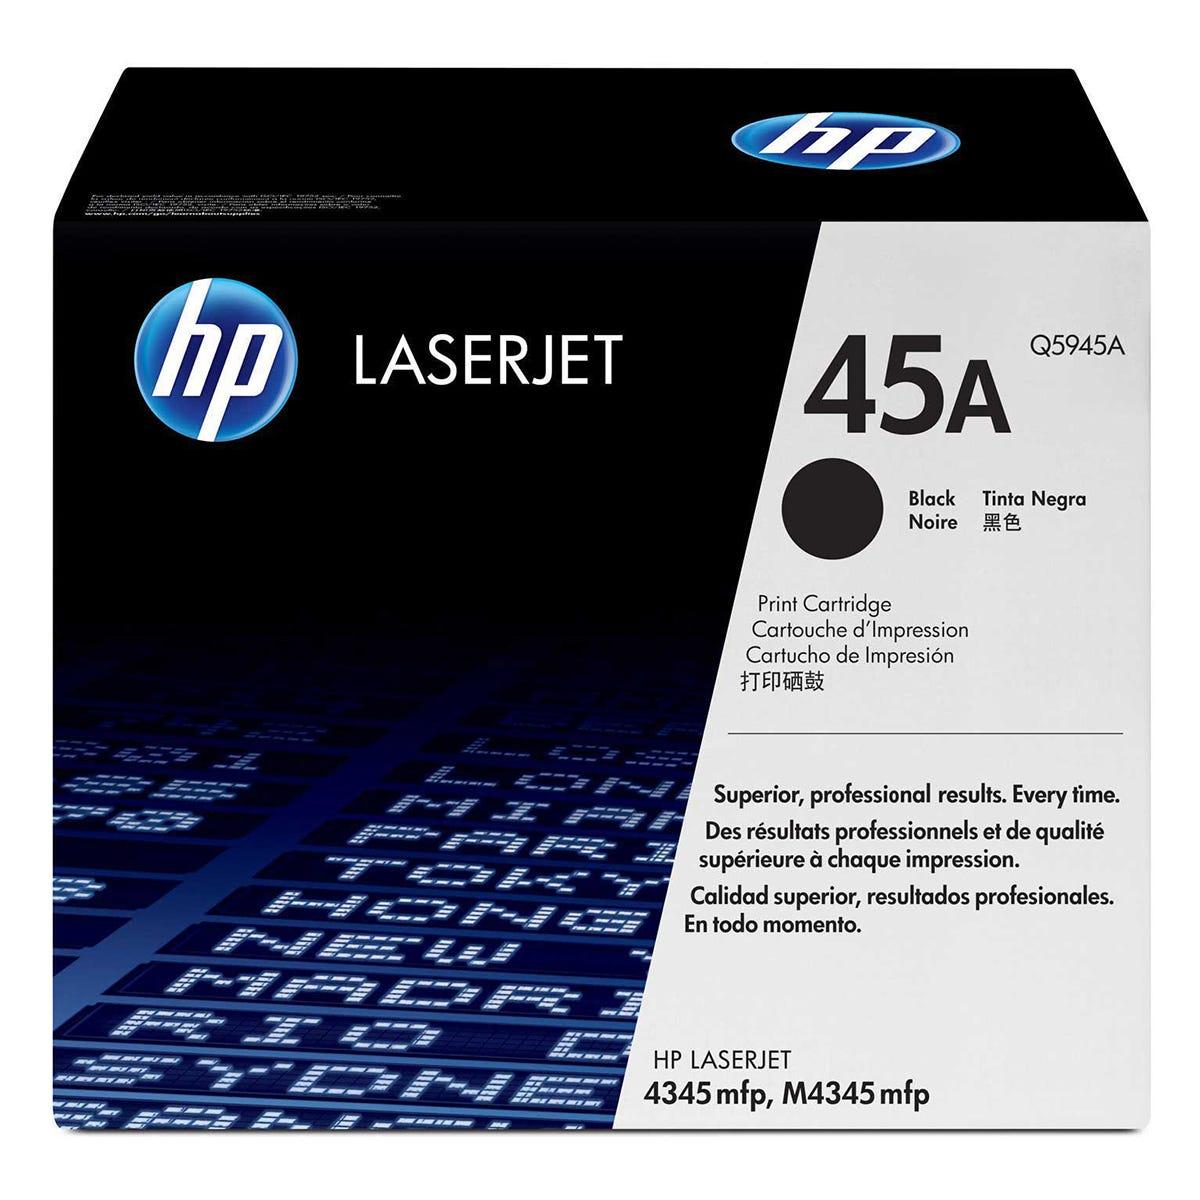 Image of HP 45A Laserjet Printer Ink Toner Cartridge, Black